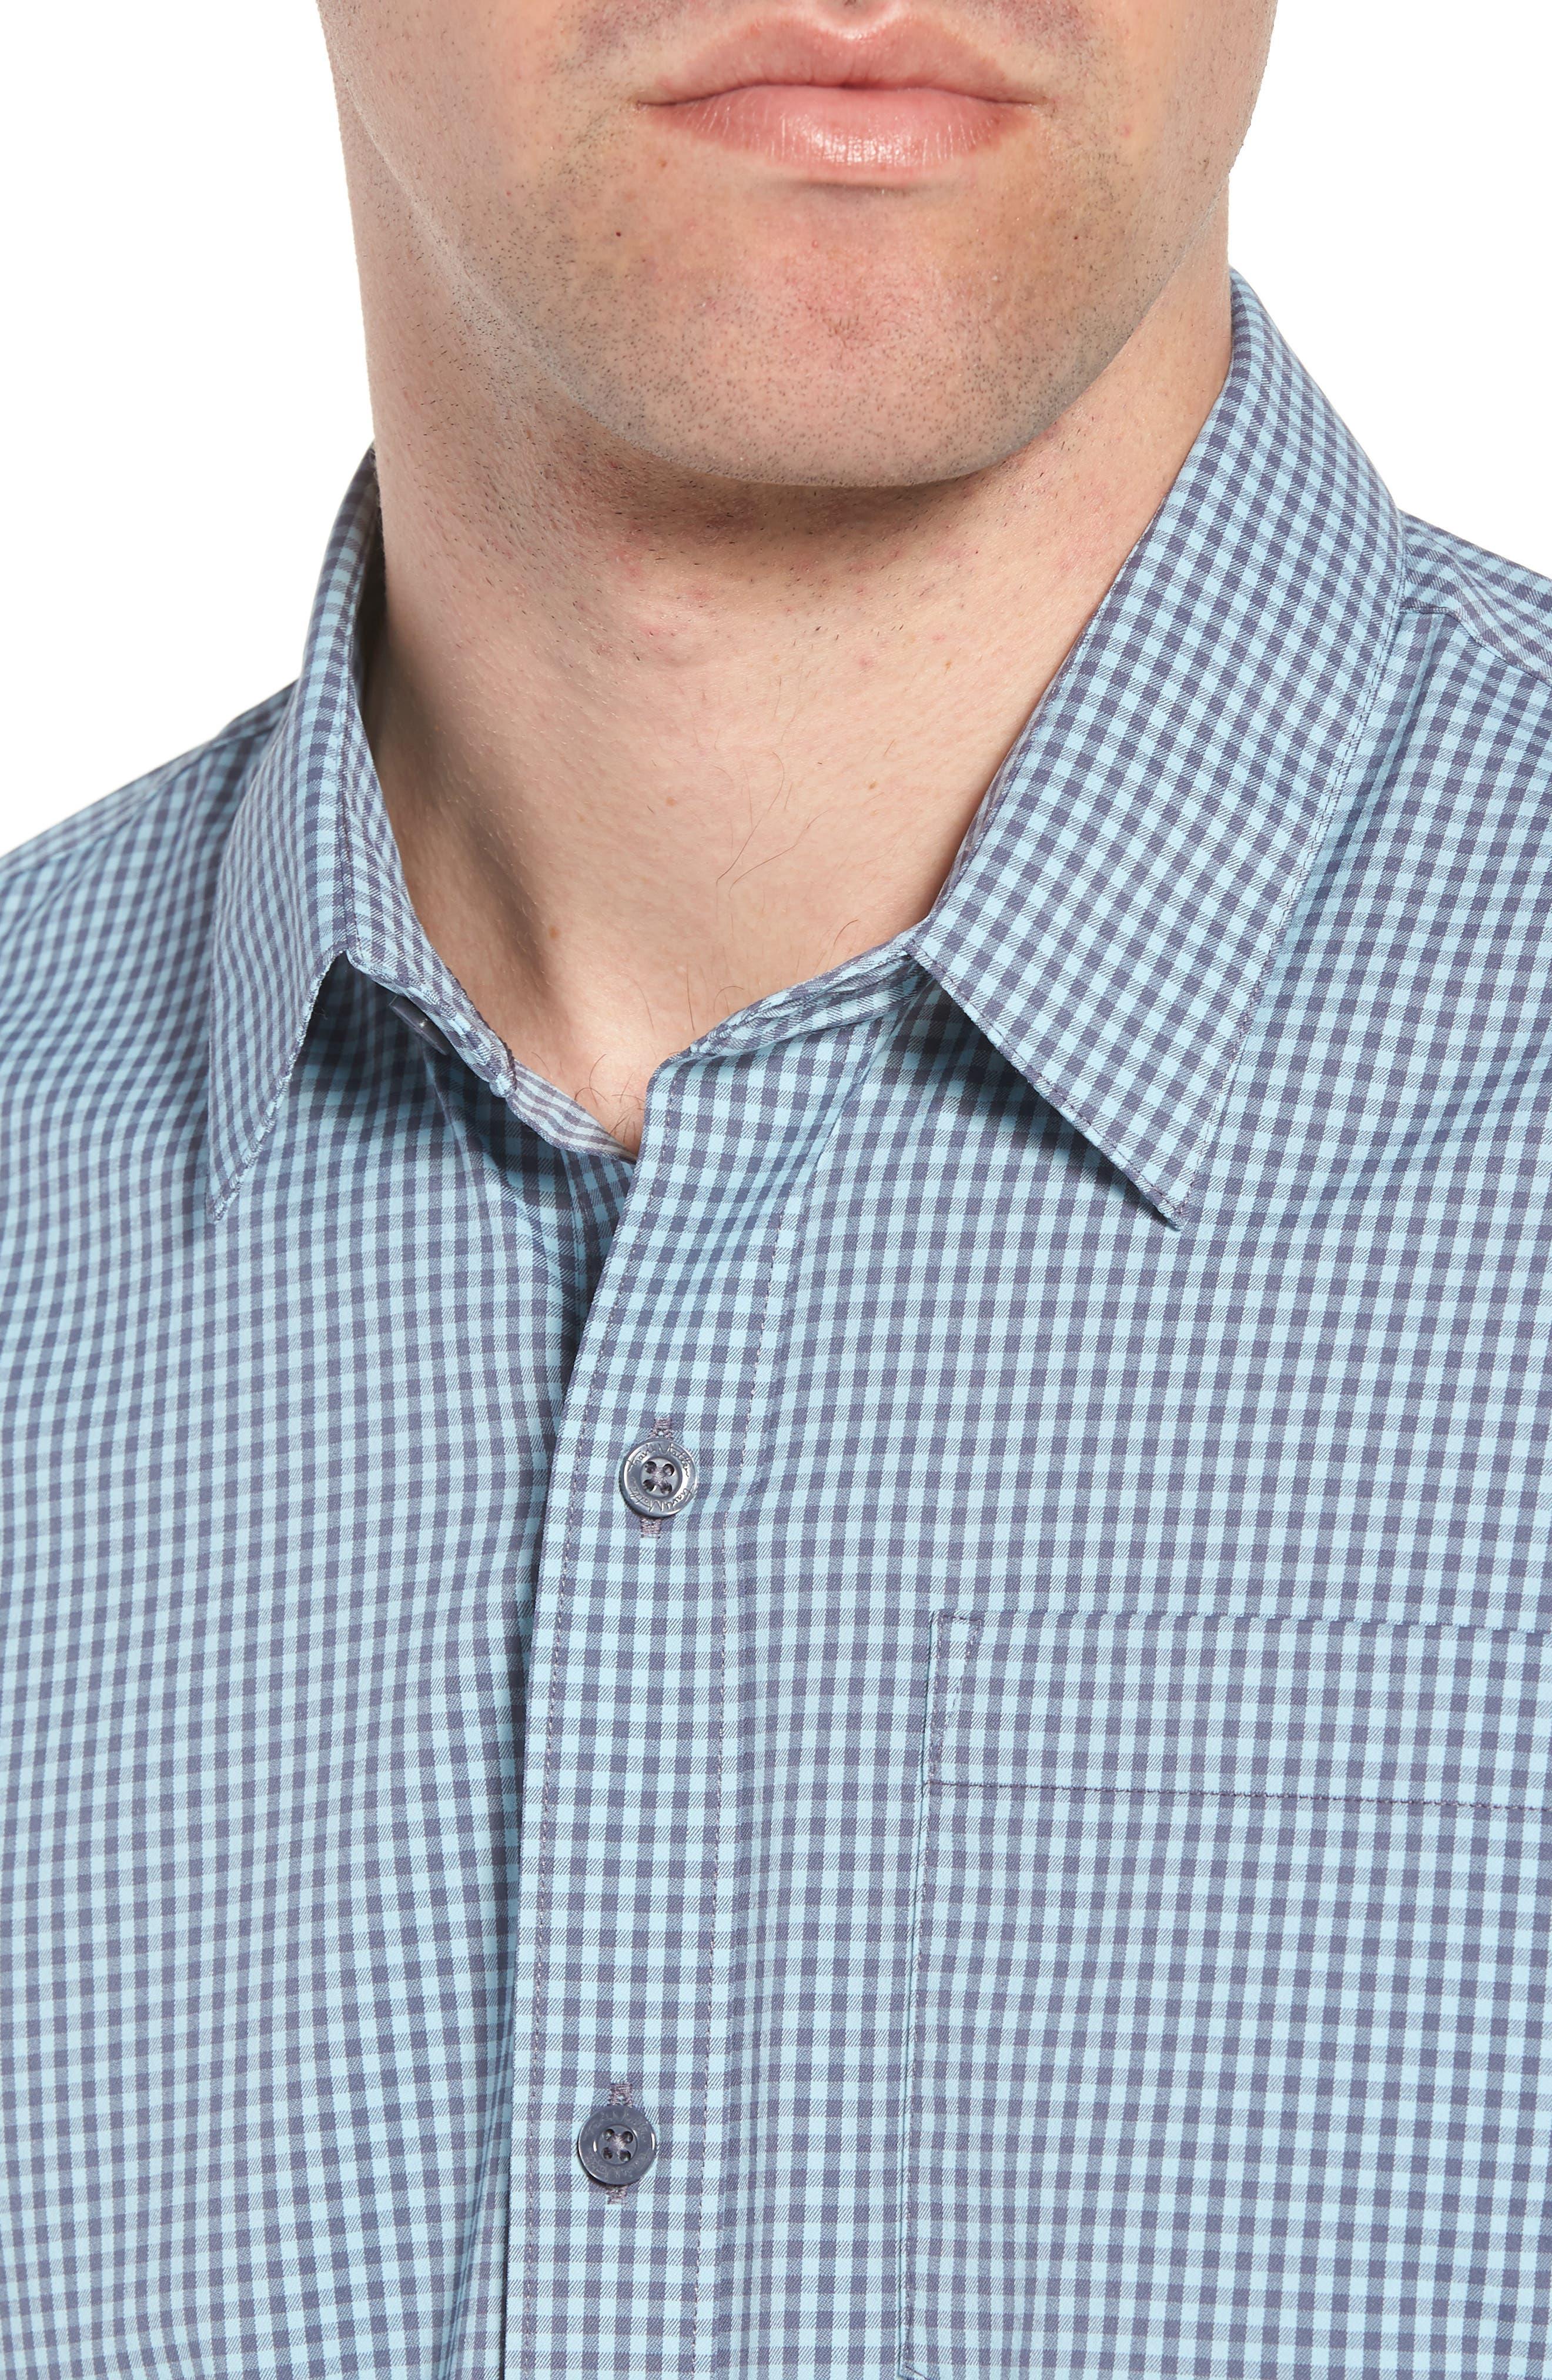 Gygax Regular Fit Sport Shirt,                             Alternate thumbnail 2, color,                             Porcelain Blue